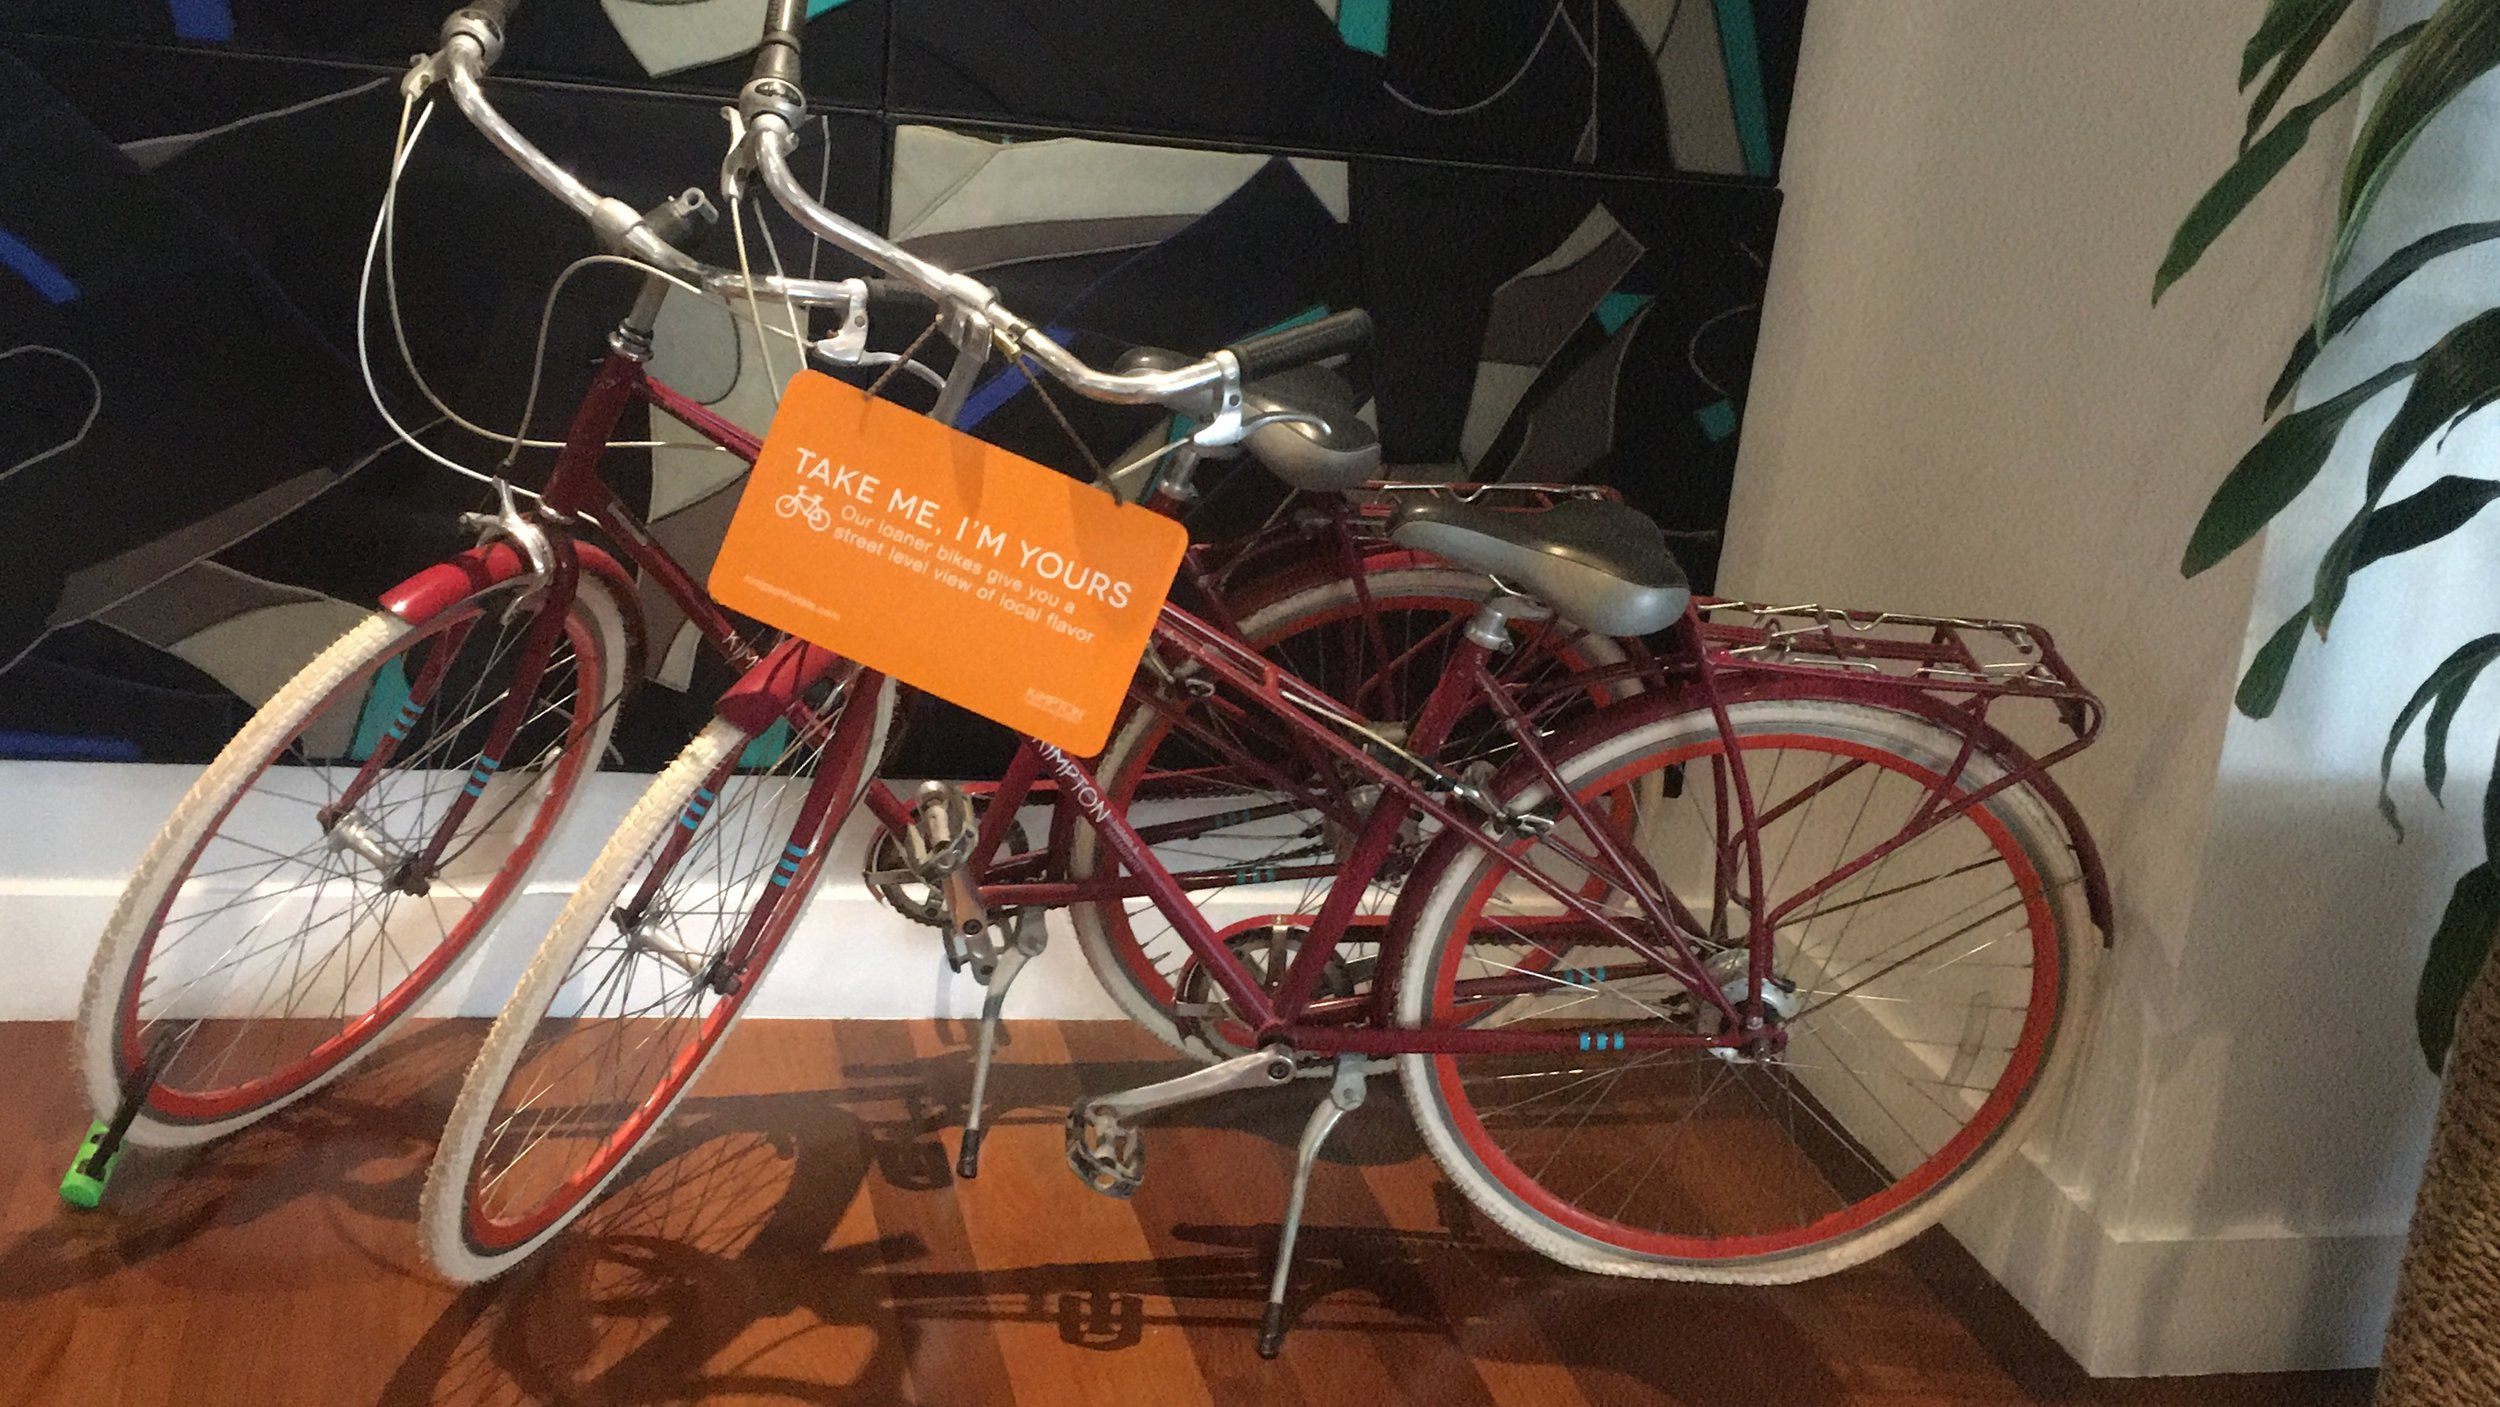 Shorebreak Hotel bicycle rental